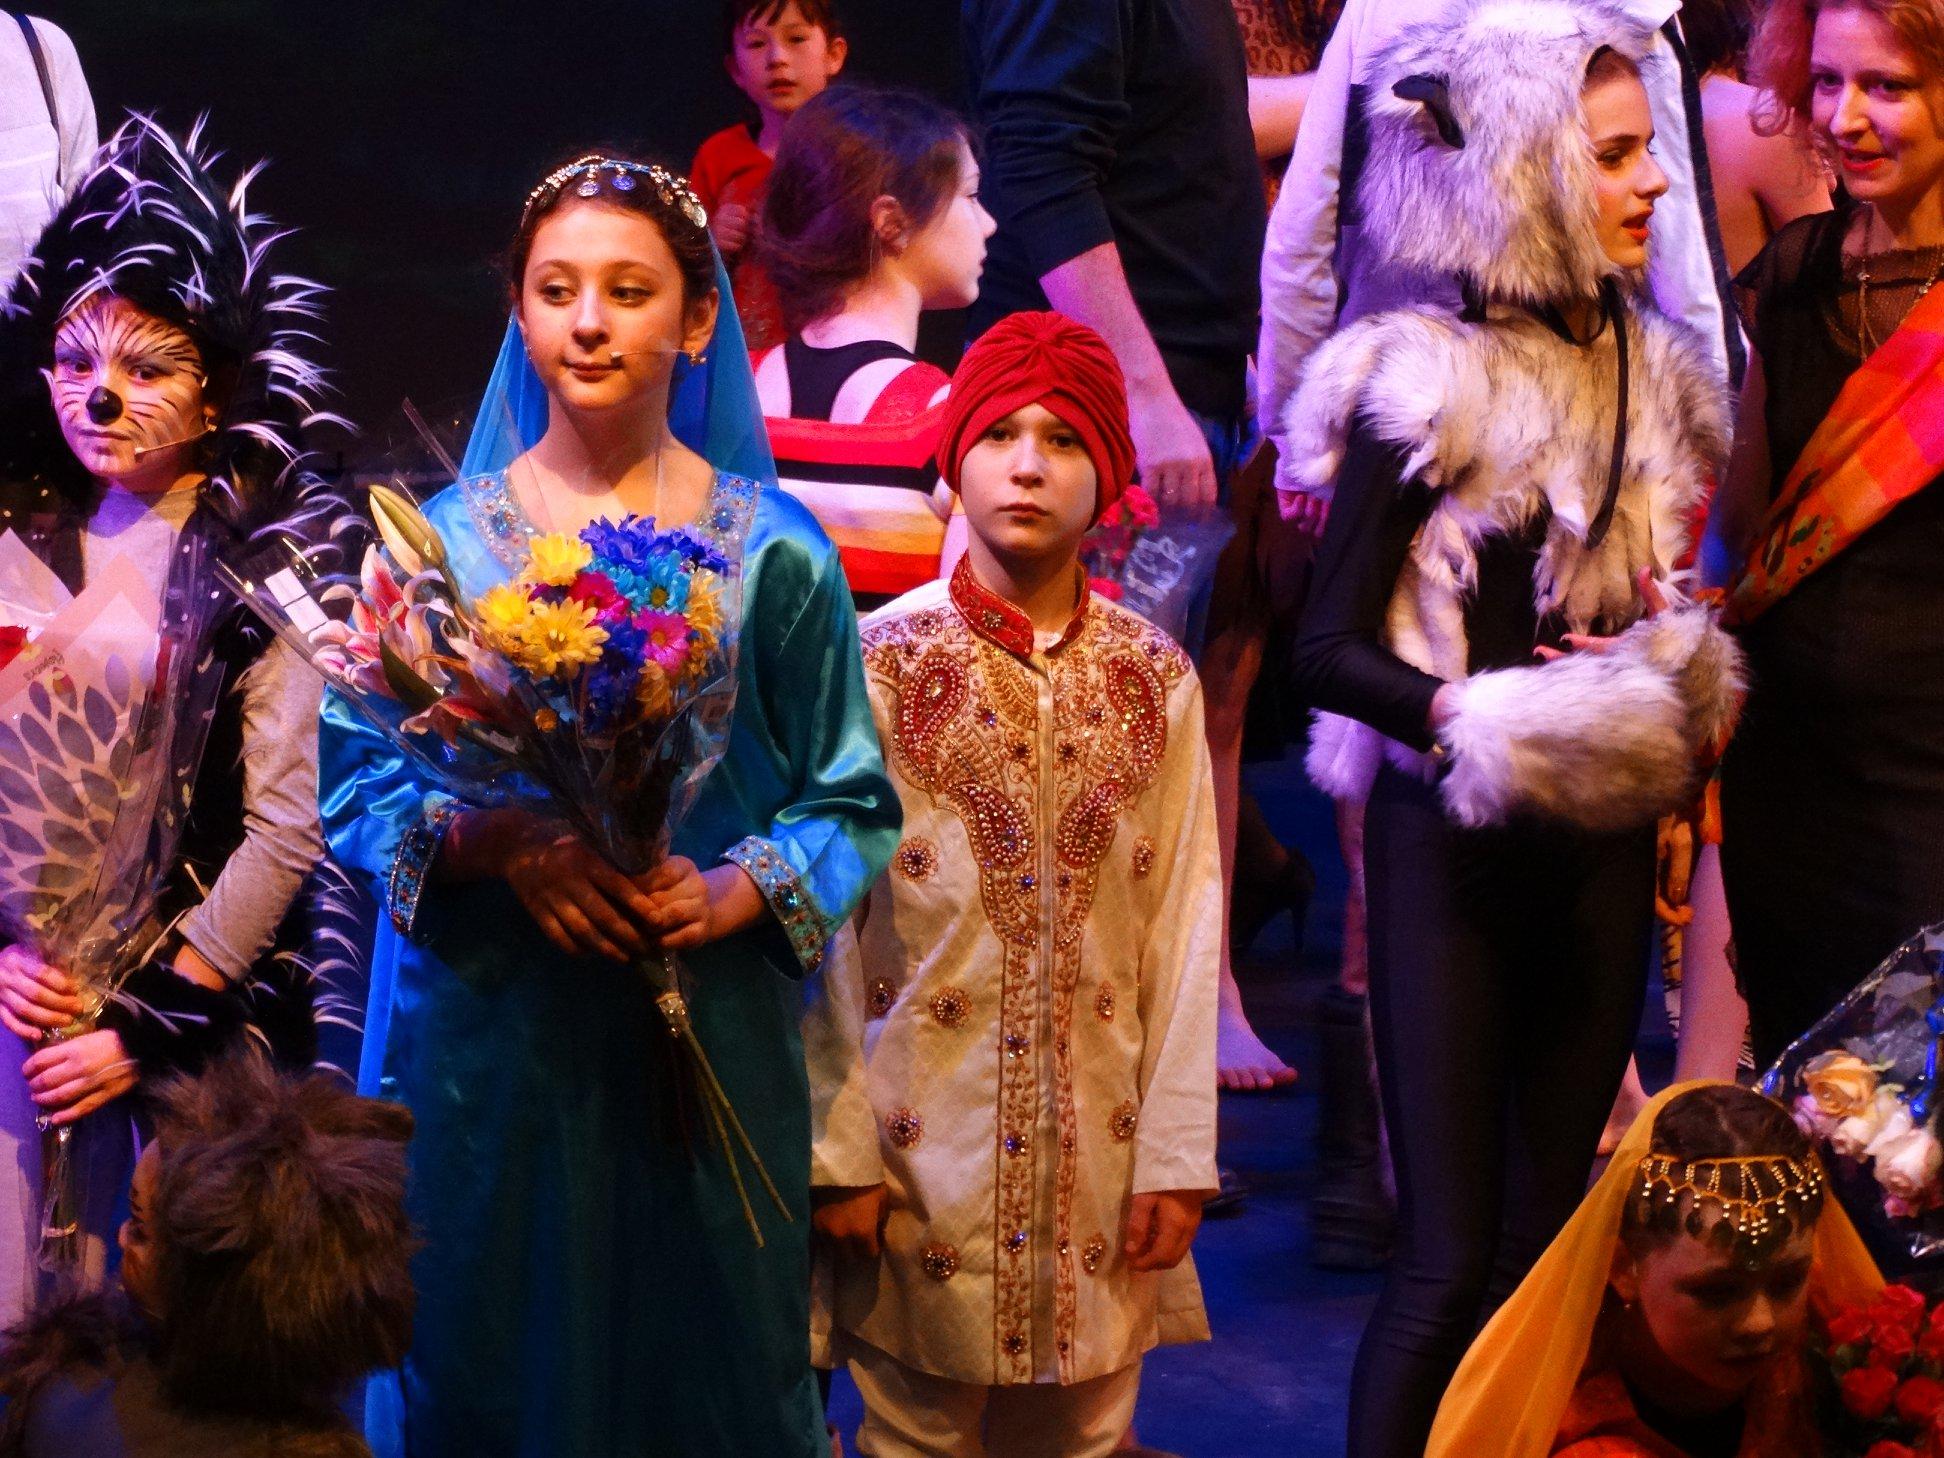 http://bravotheater.com/images/reviews/Mowgli7.jpg